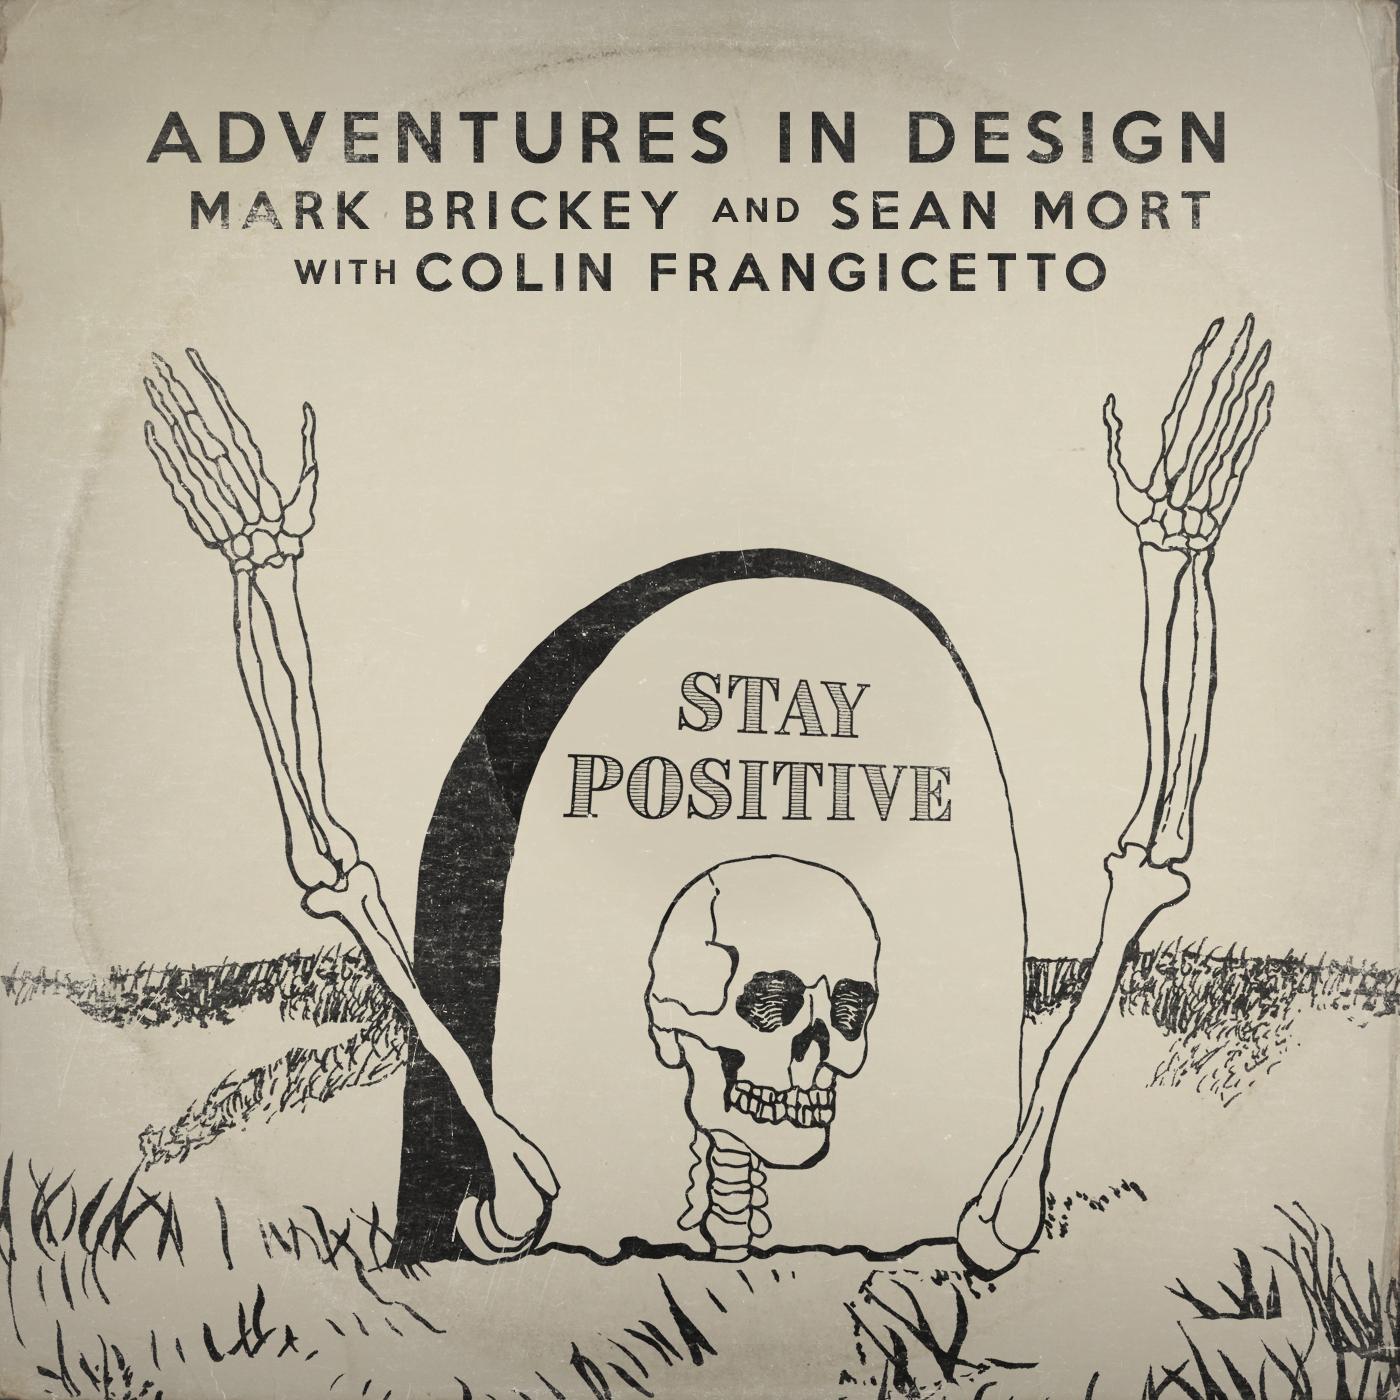 Episode 370 - Shop Talk with Sean Mort & Colin Frangicetto